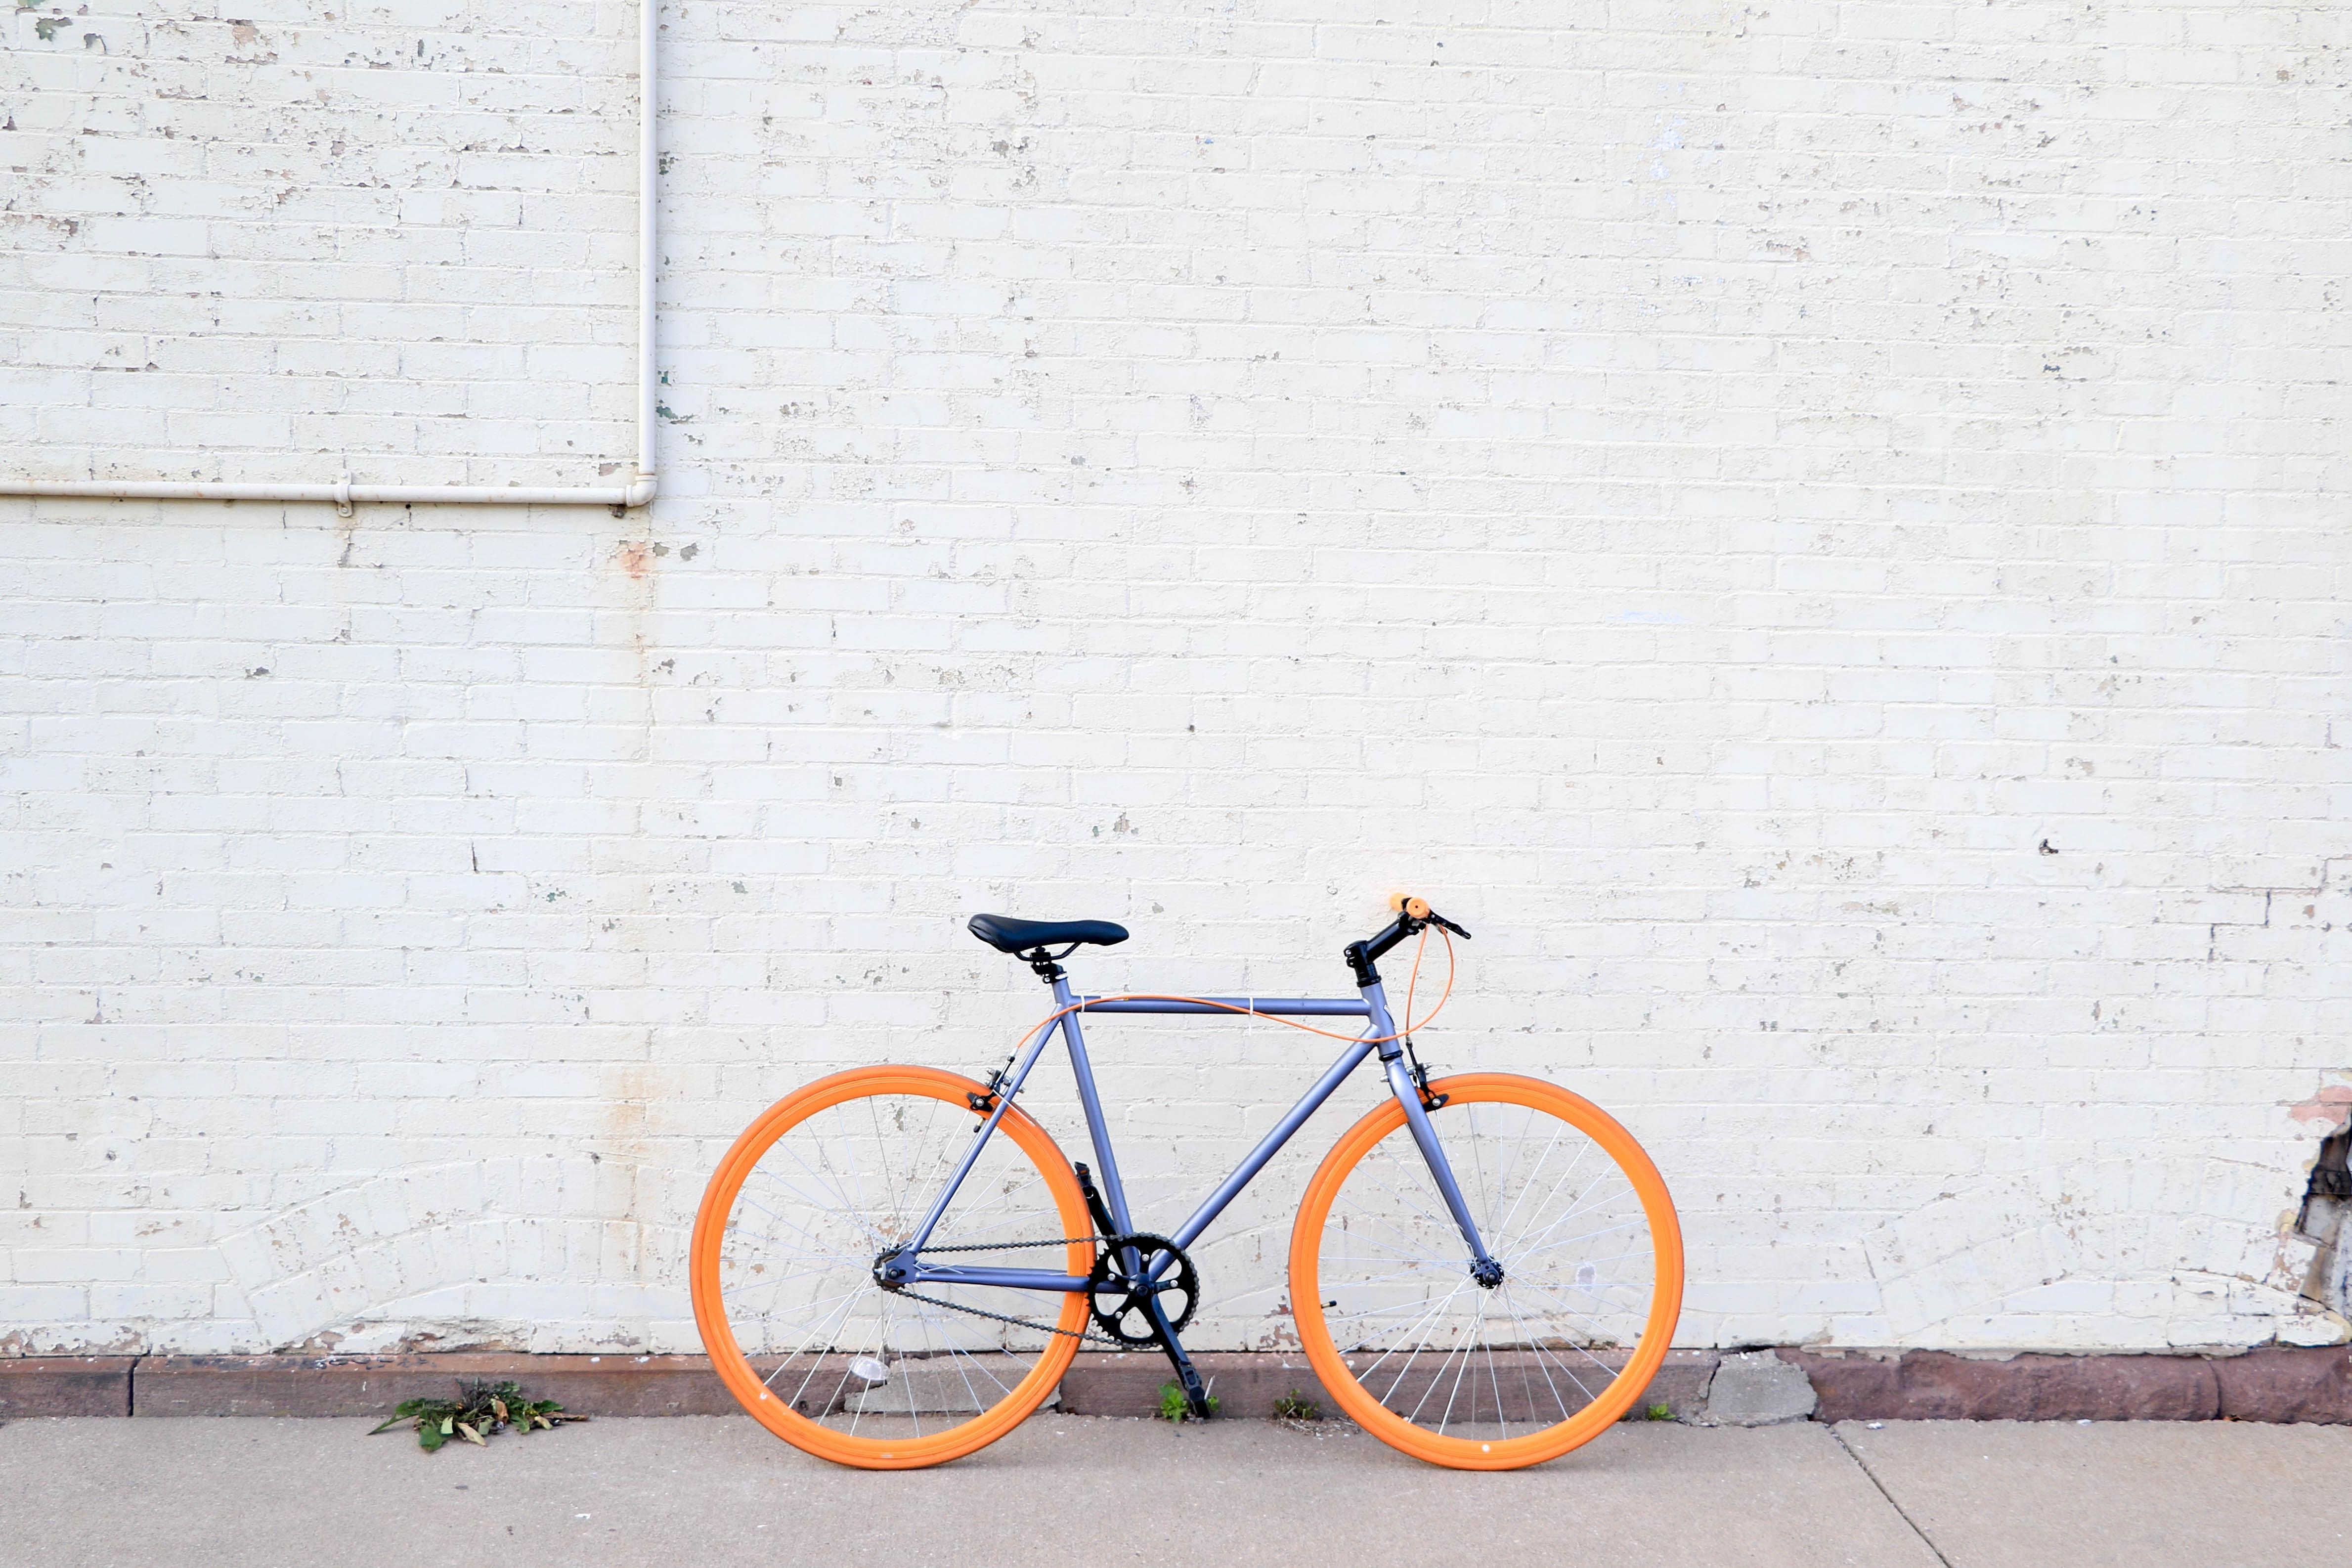 New bike photo wallpaper download full hd 2020